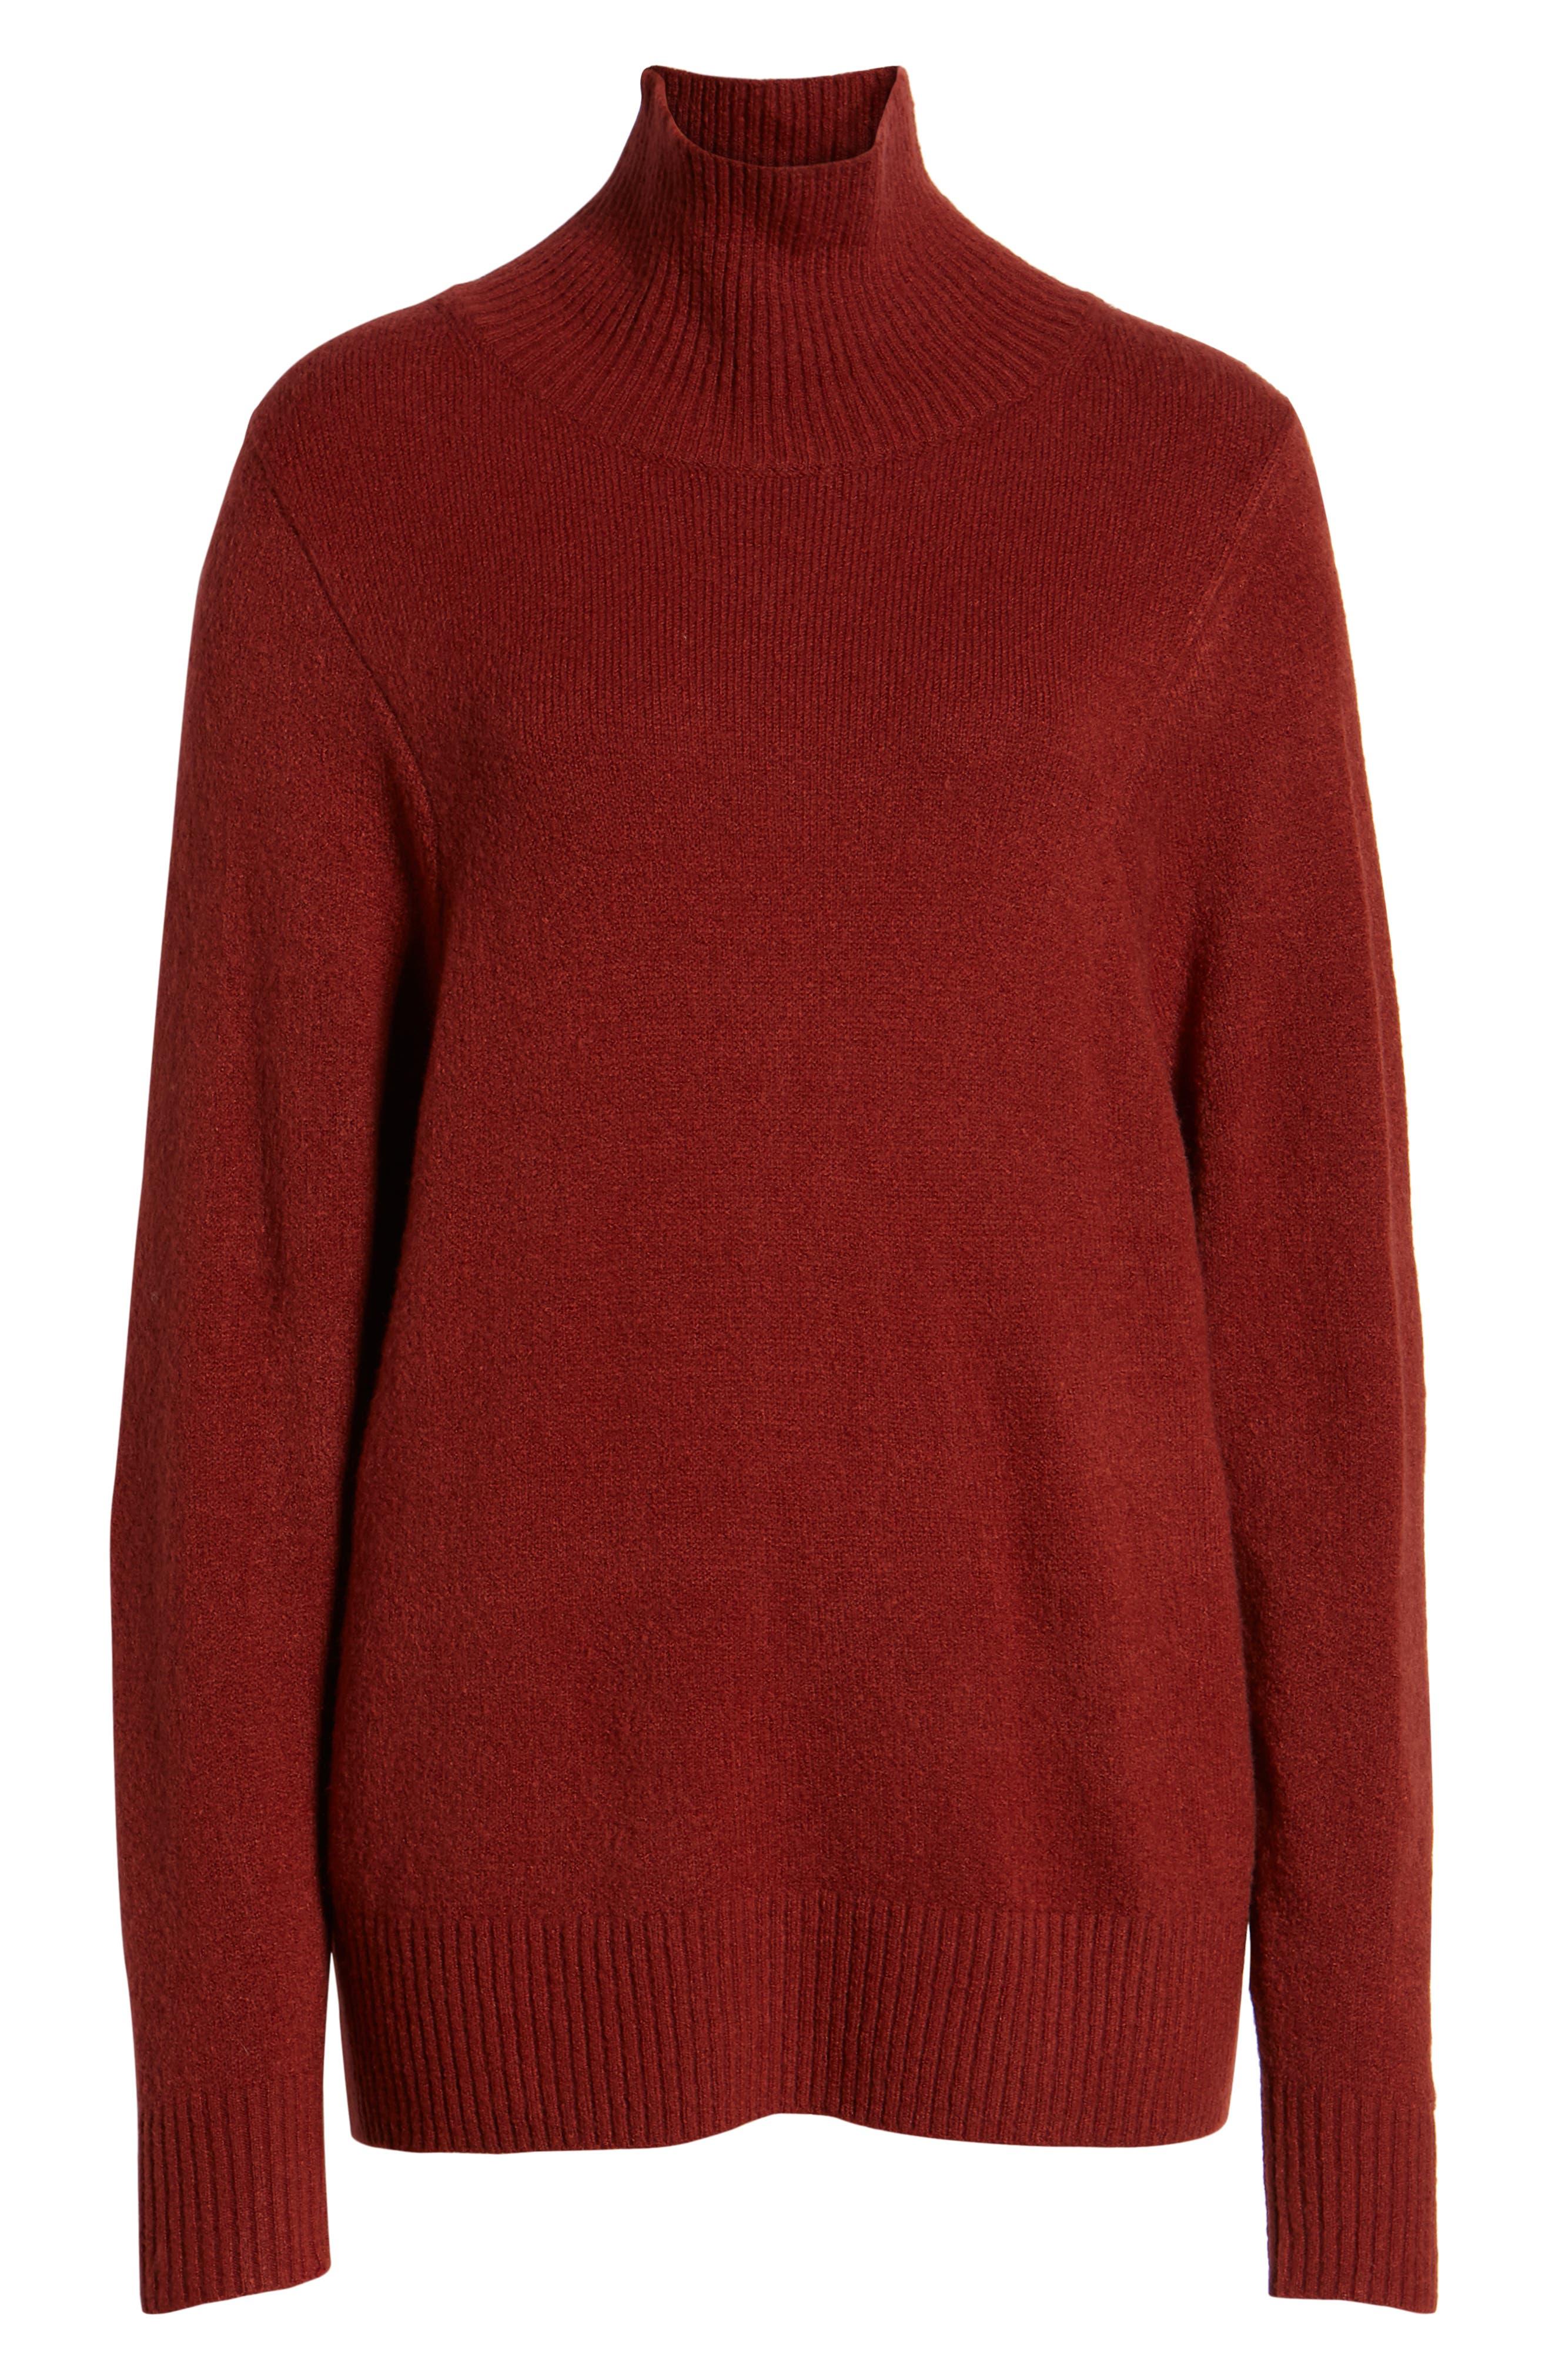 Seasonal Pullover Sweater,                             Alternate thumbnail 6, color,                             BURGUNDY RUSSET